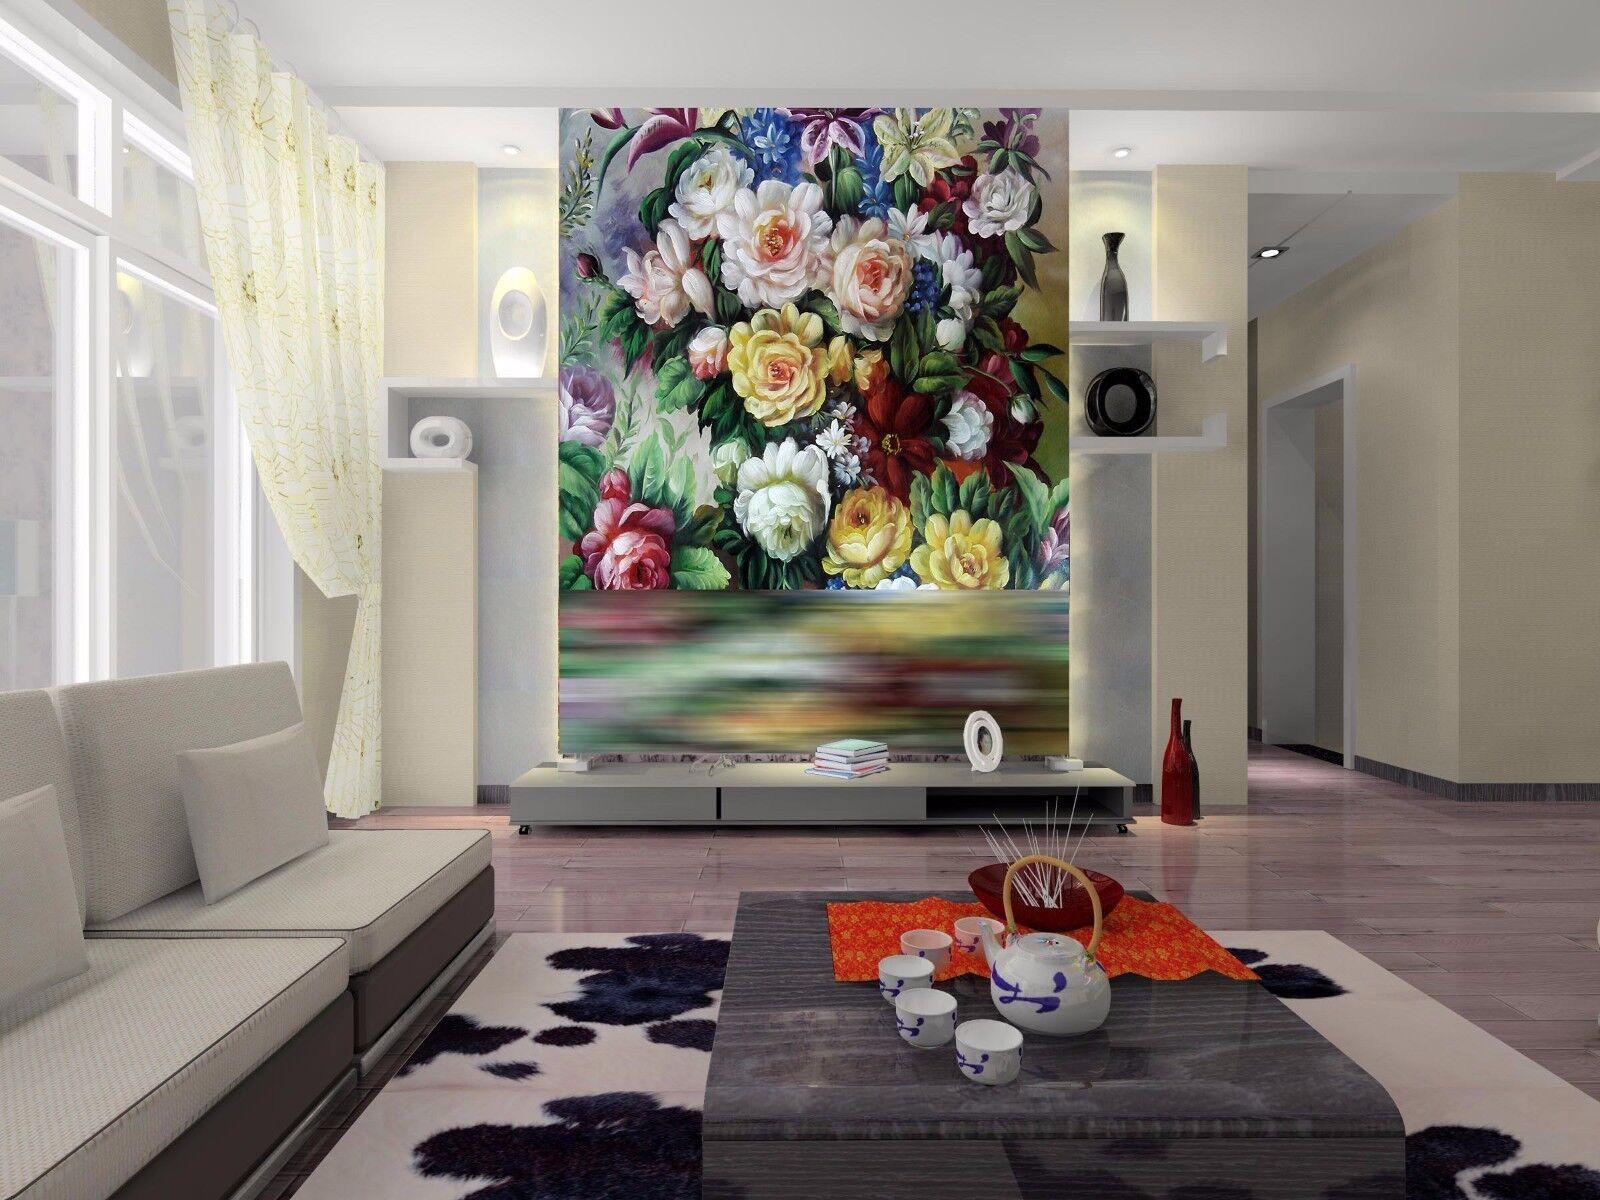 3D Schöne Blaumen Malerei 96 Tapete Wandgemälde Tapete Tapeten Bild Familie DE | Gutes Design  | Neuheit  |